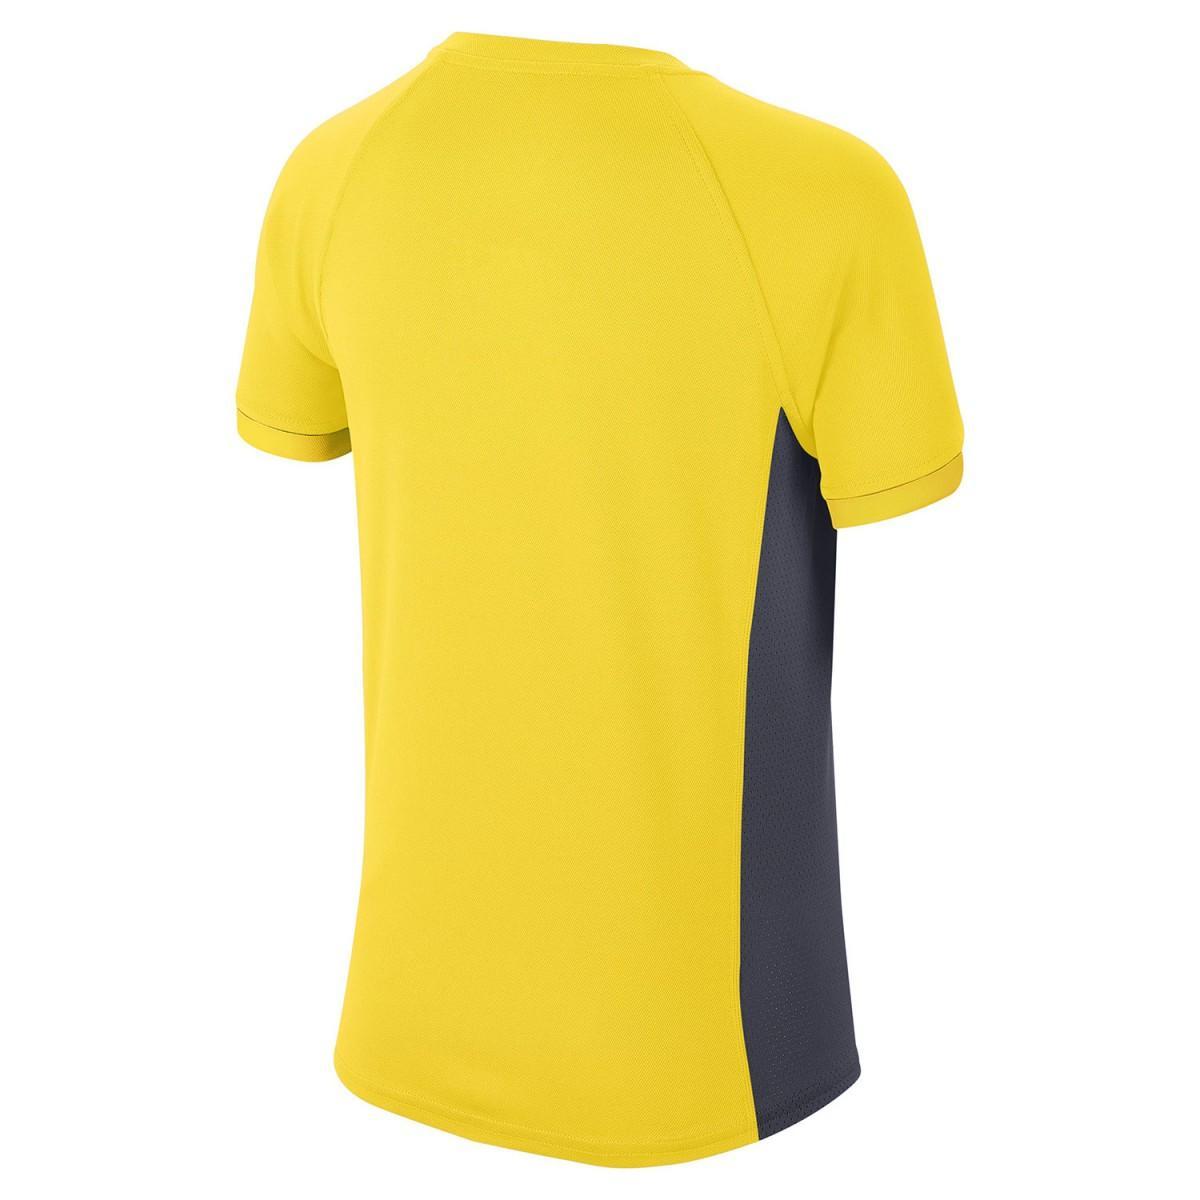 Теннисная футболка детская Nike Court Dry T-Shirt Boy opti yellow/gridiron